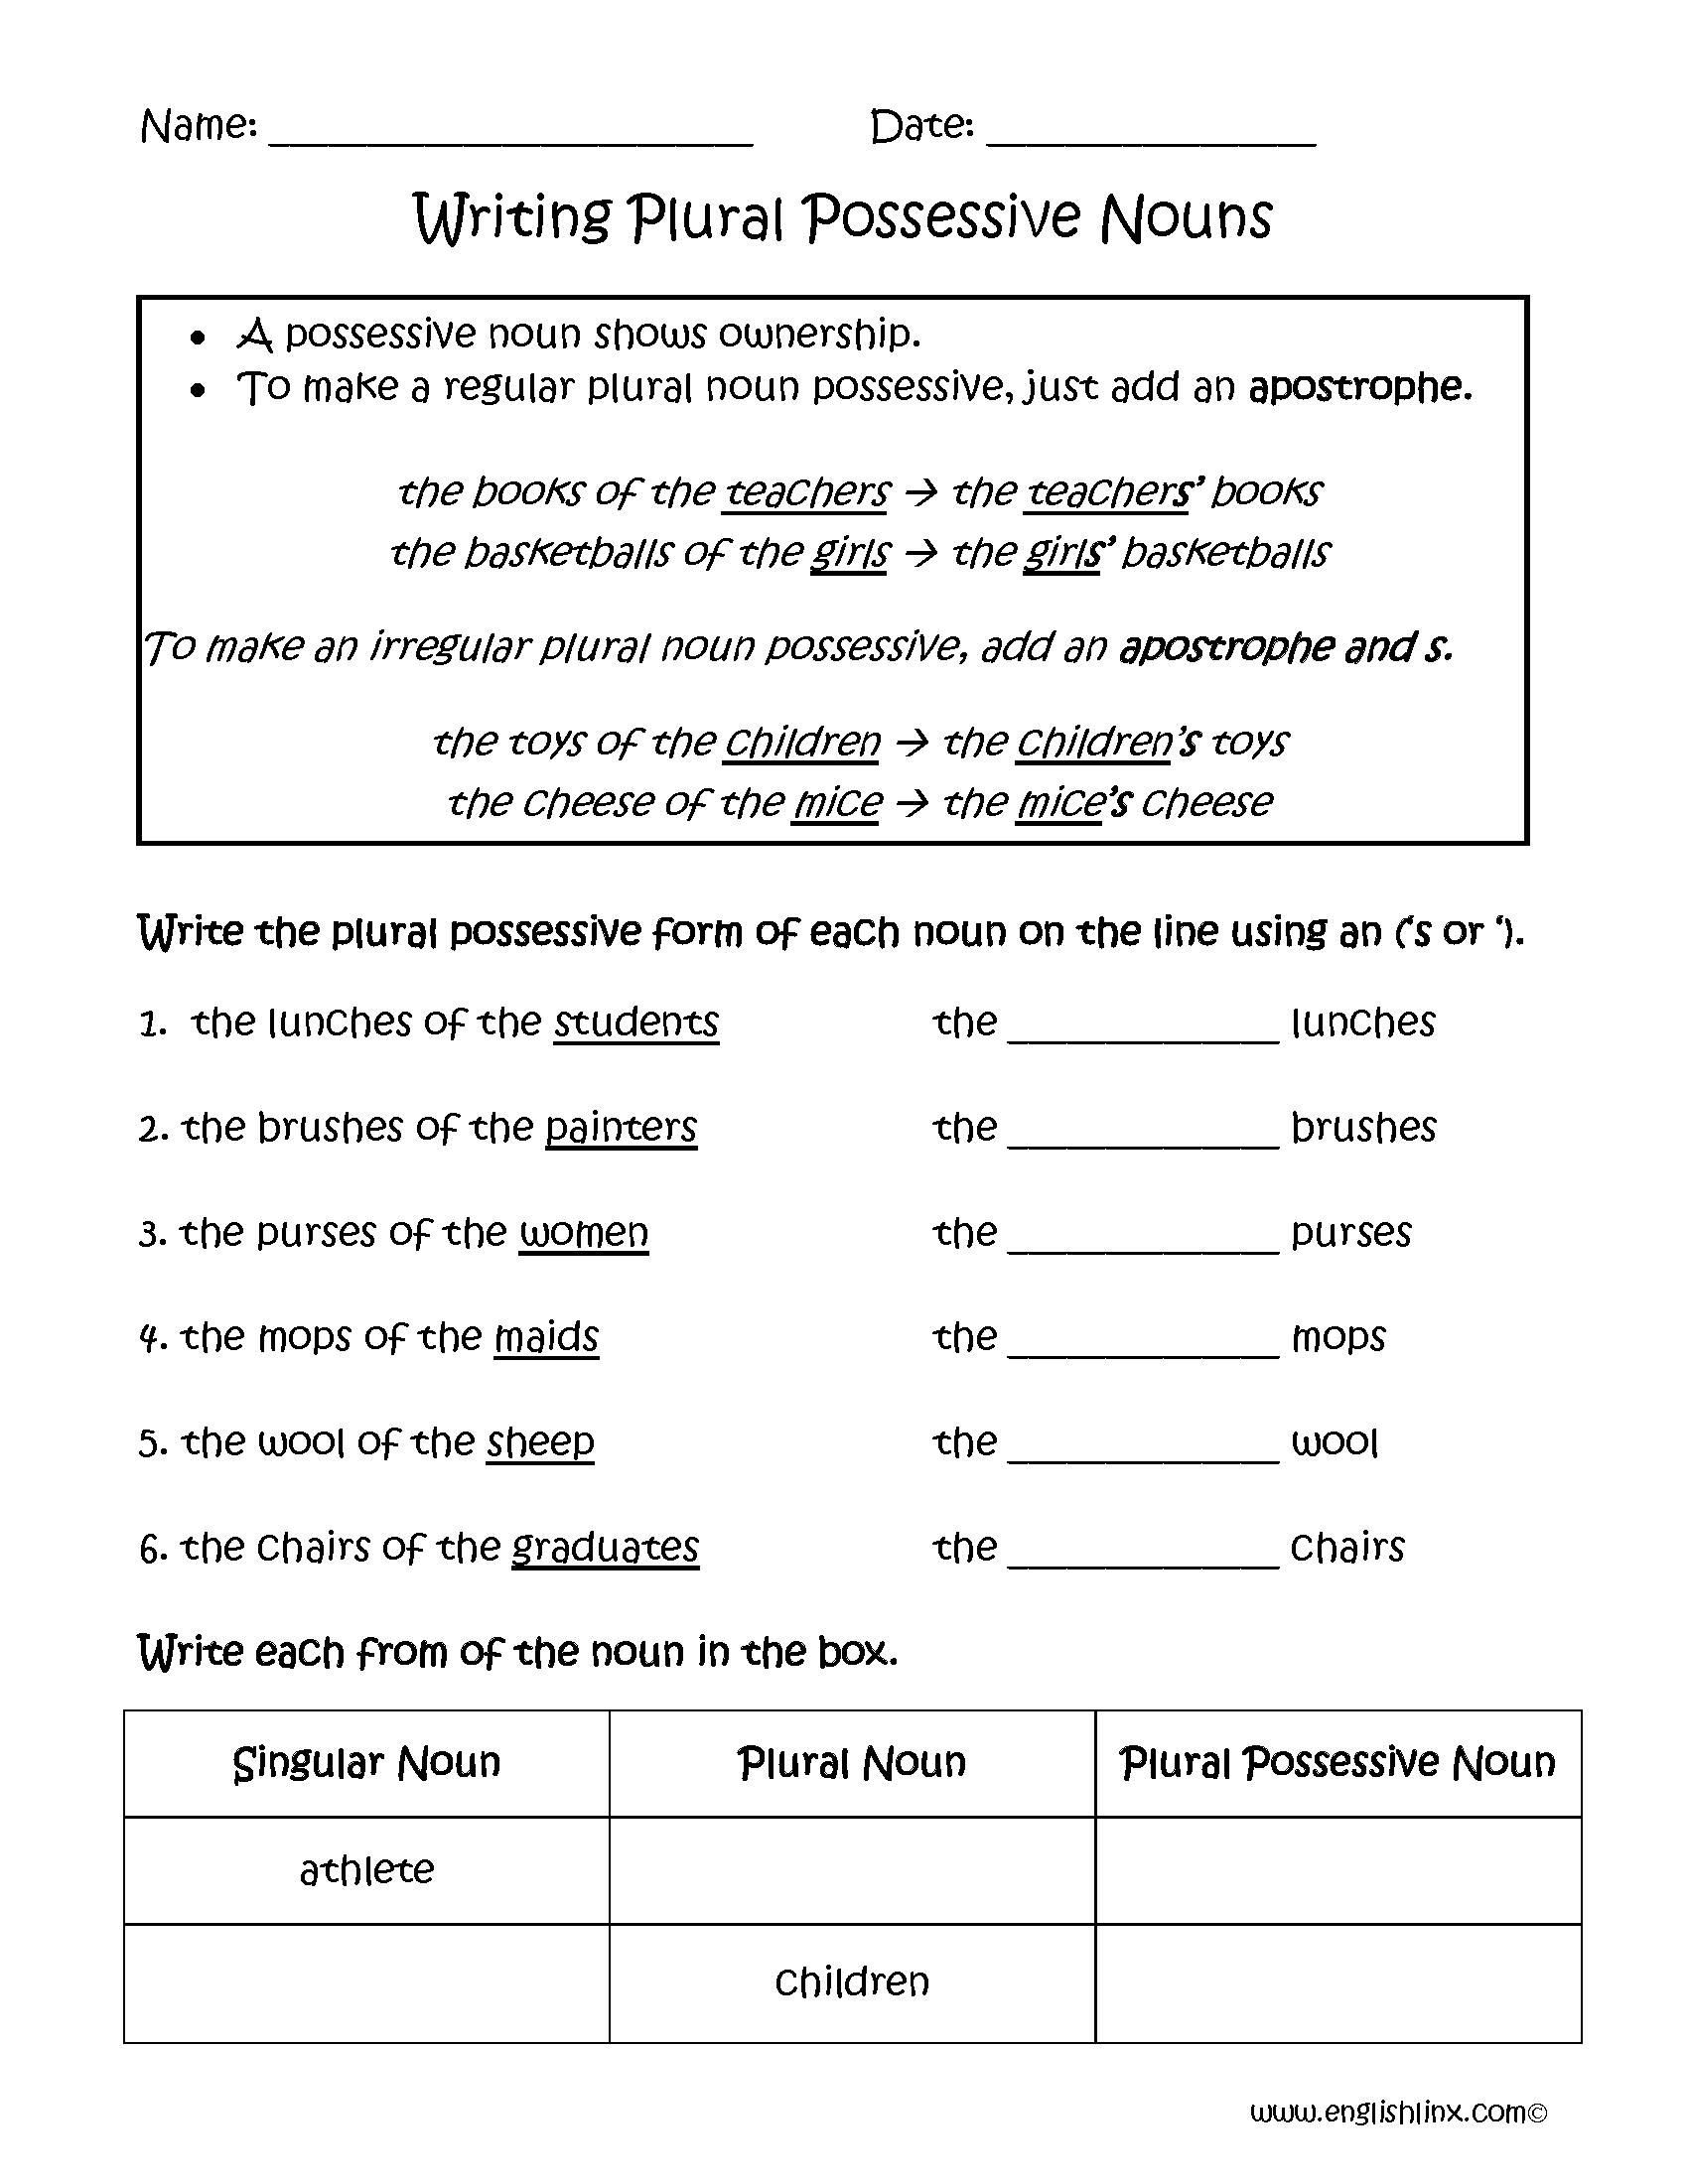 Possessive Nouns Worksheet Second Grade The Best Worksheets Image